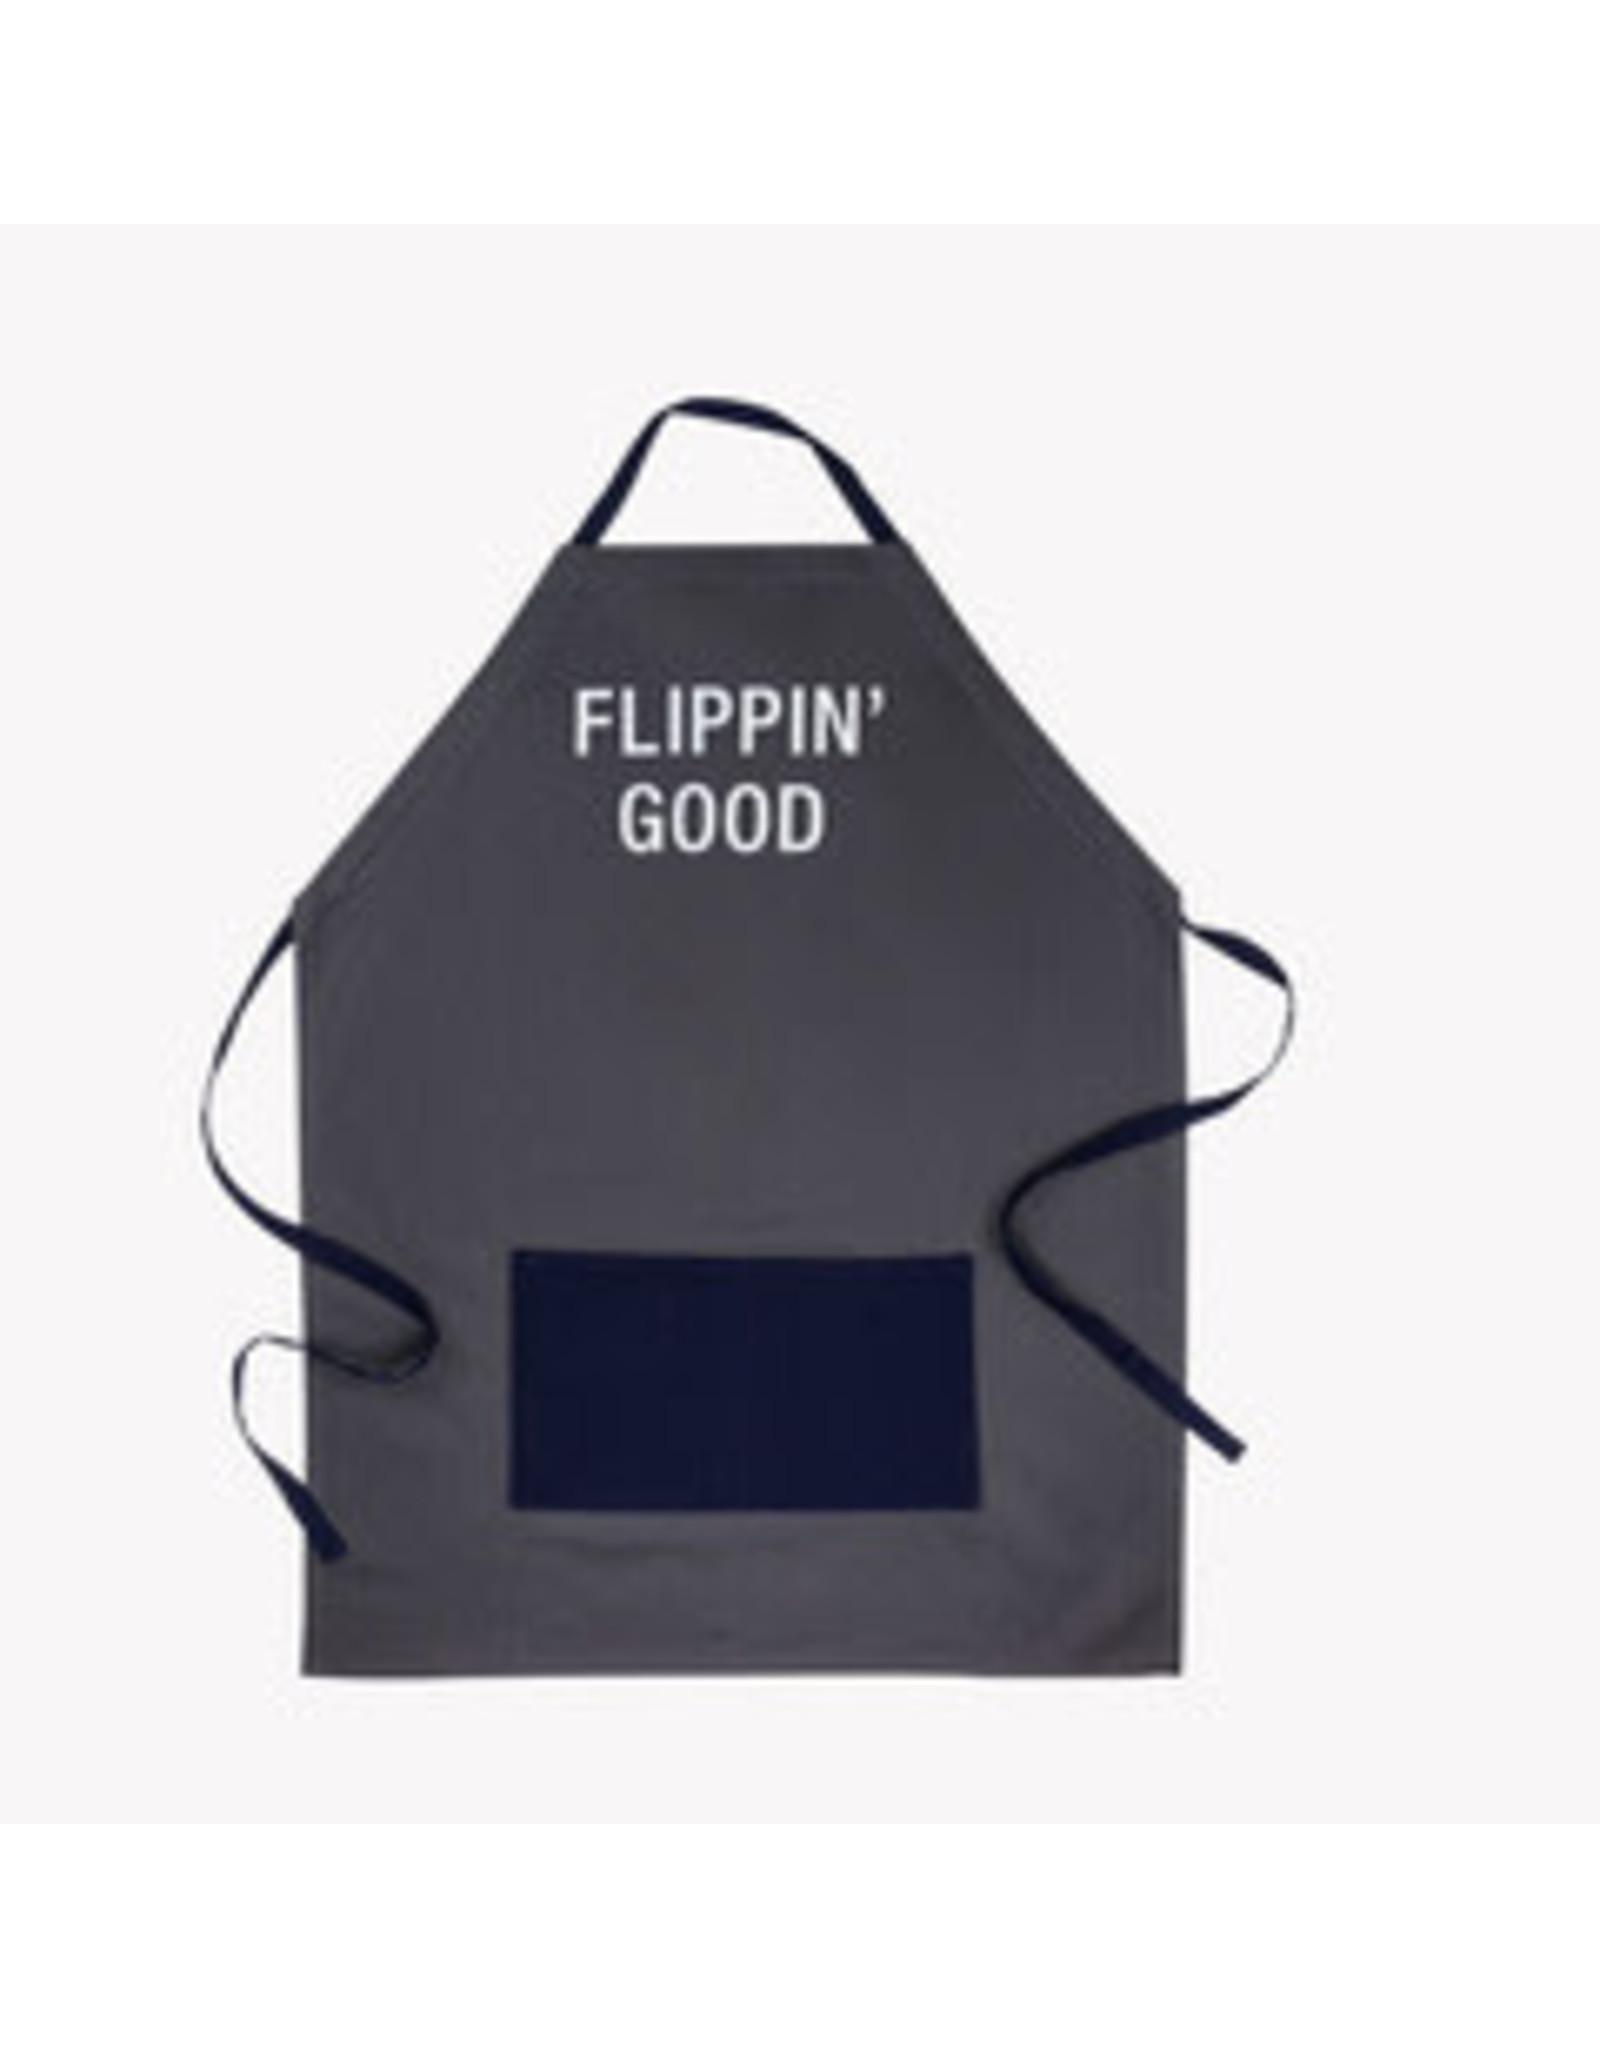 Flippin' Good Apron